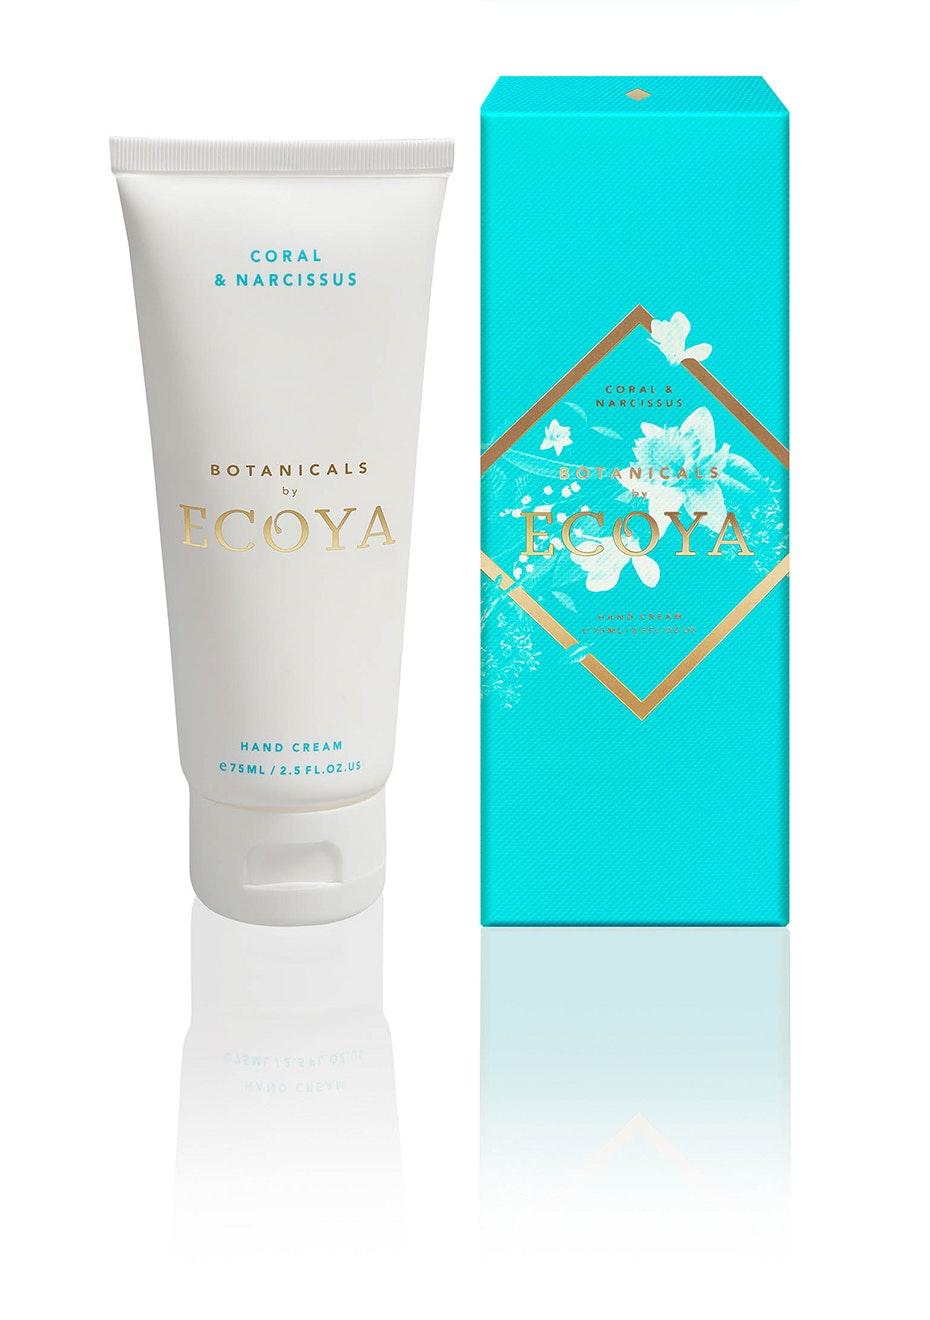 Ecoya - Hand Cream - Coral & Narcissus